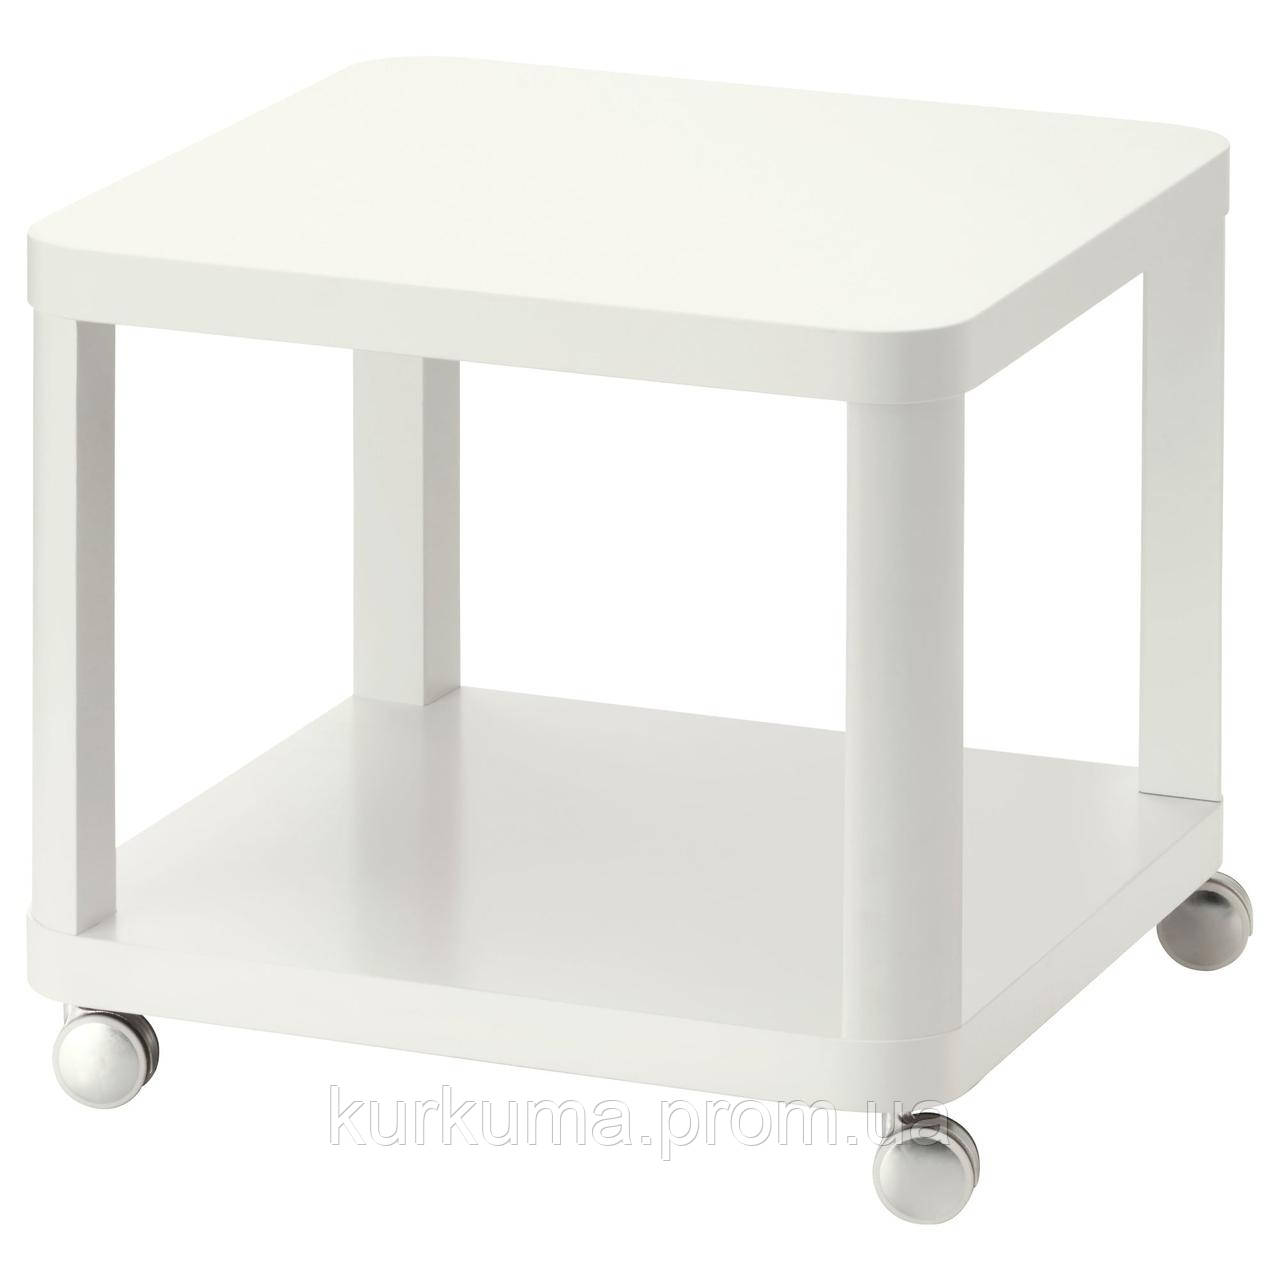 IKEA TINGBY Стол на колесиках, белый  (202.959.30)